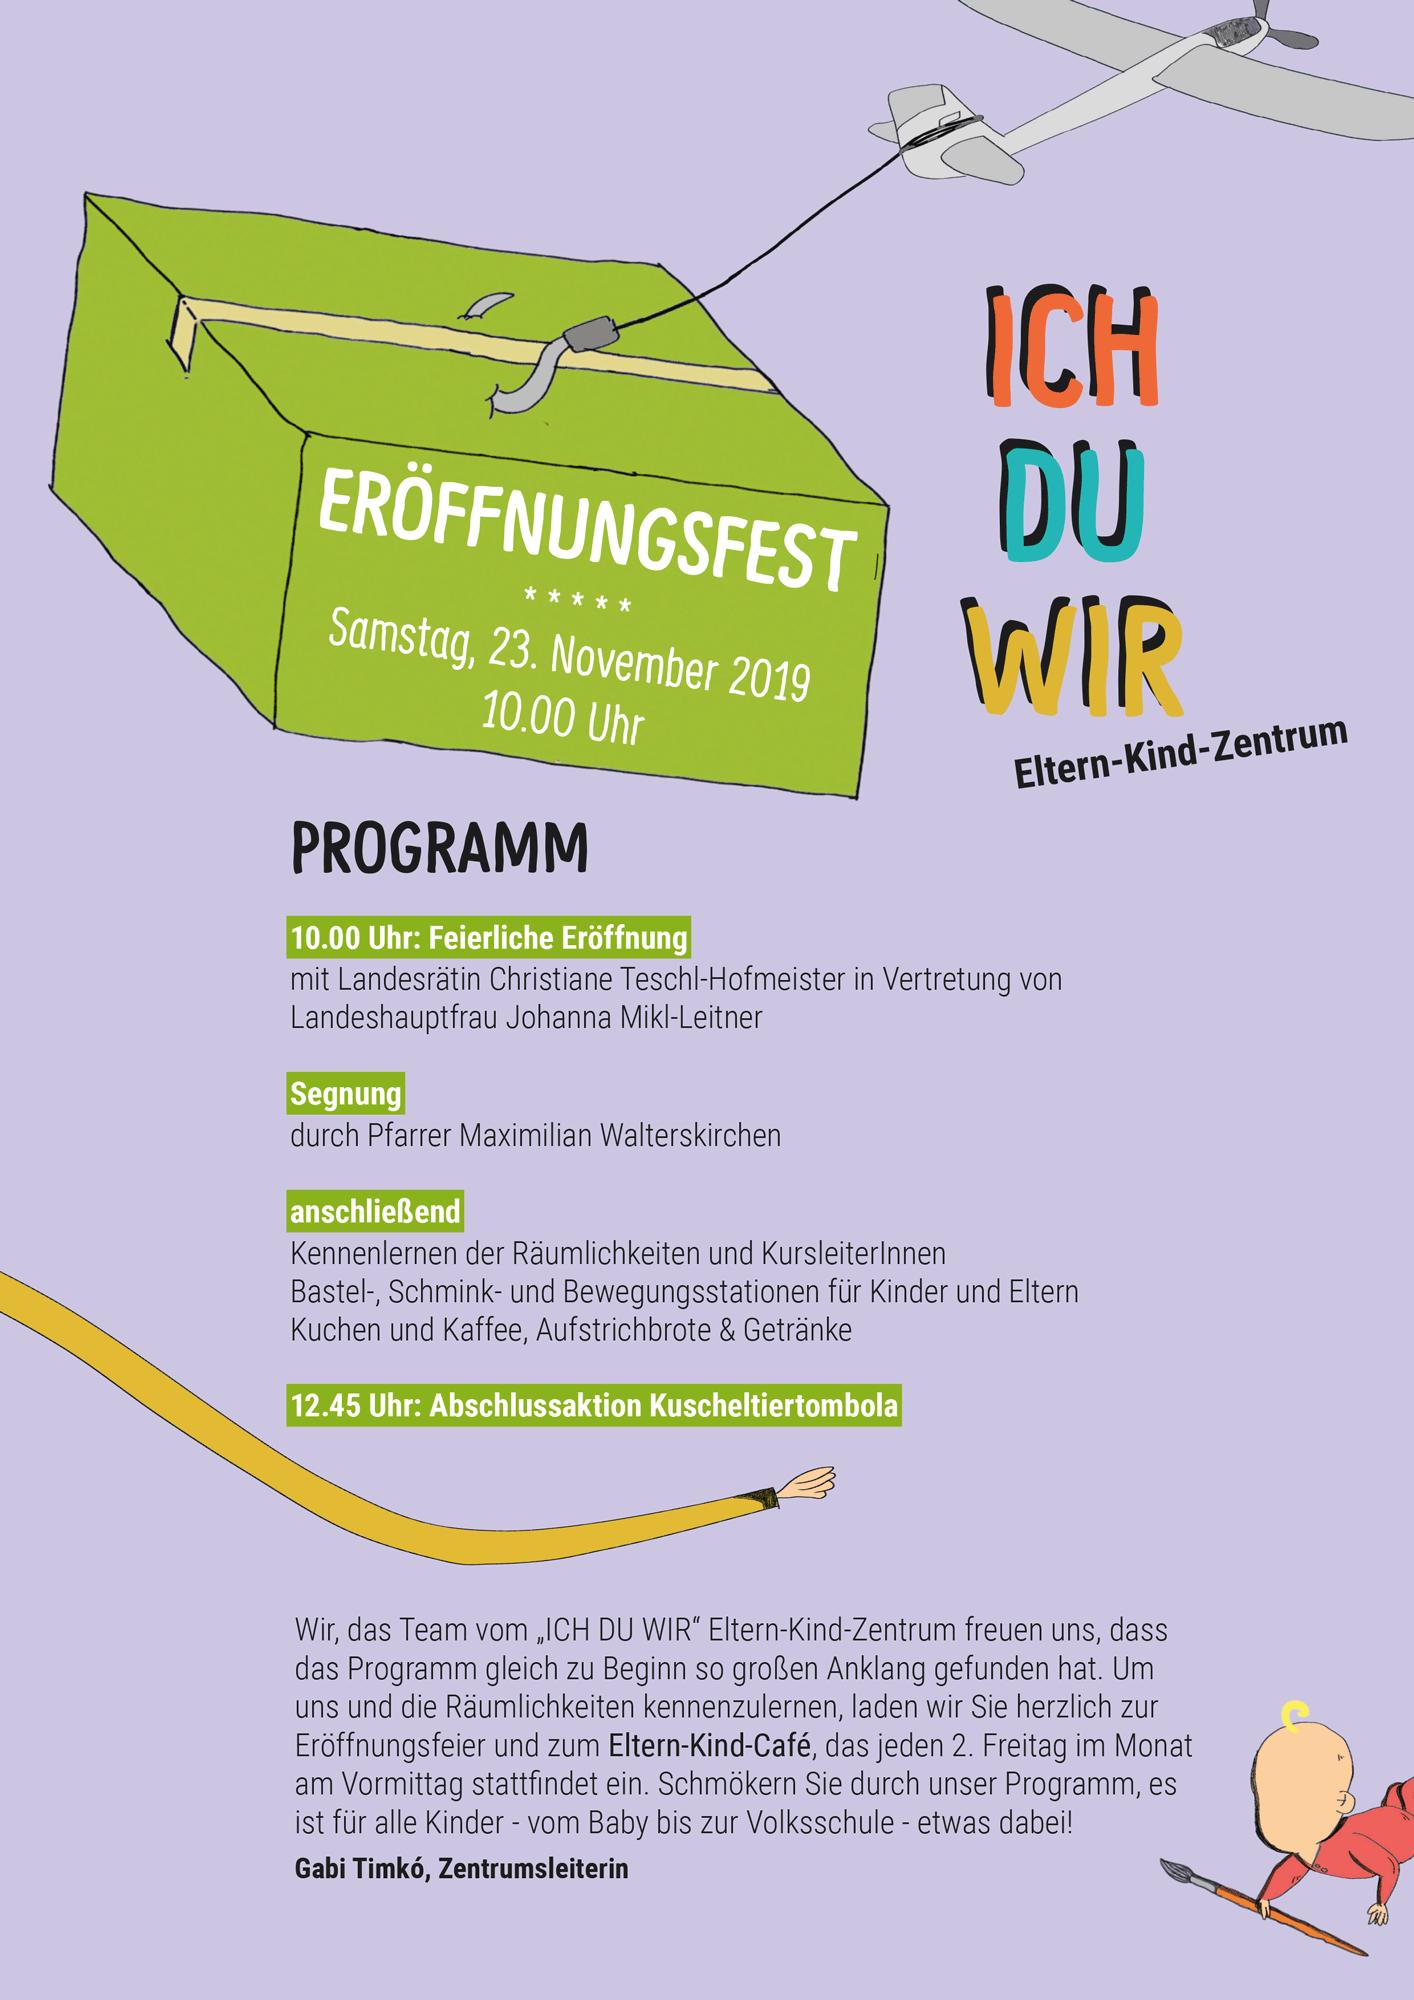 Sex in Kirchberg am Wagram - Erotik & Sexkontakte bei